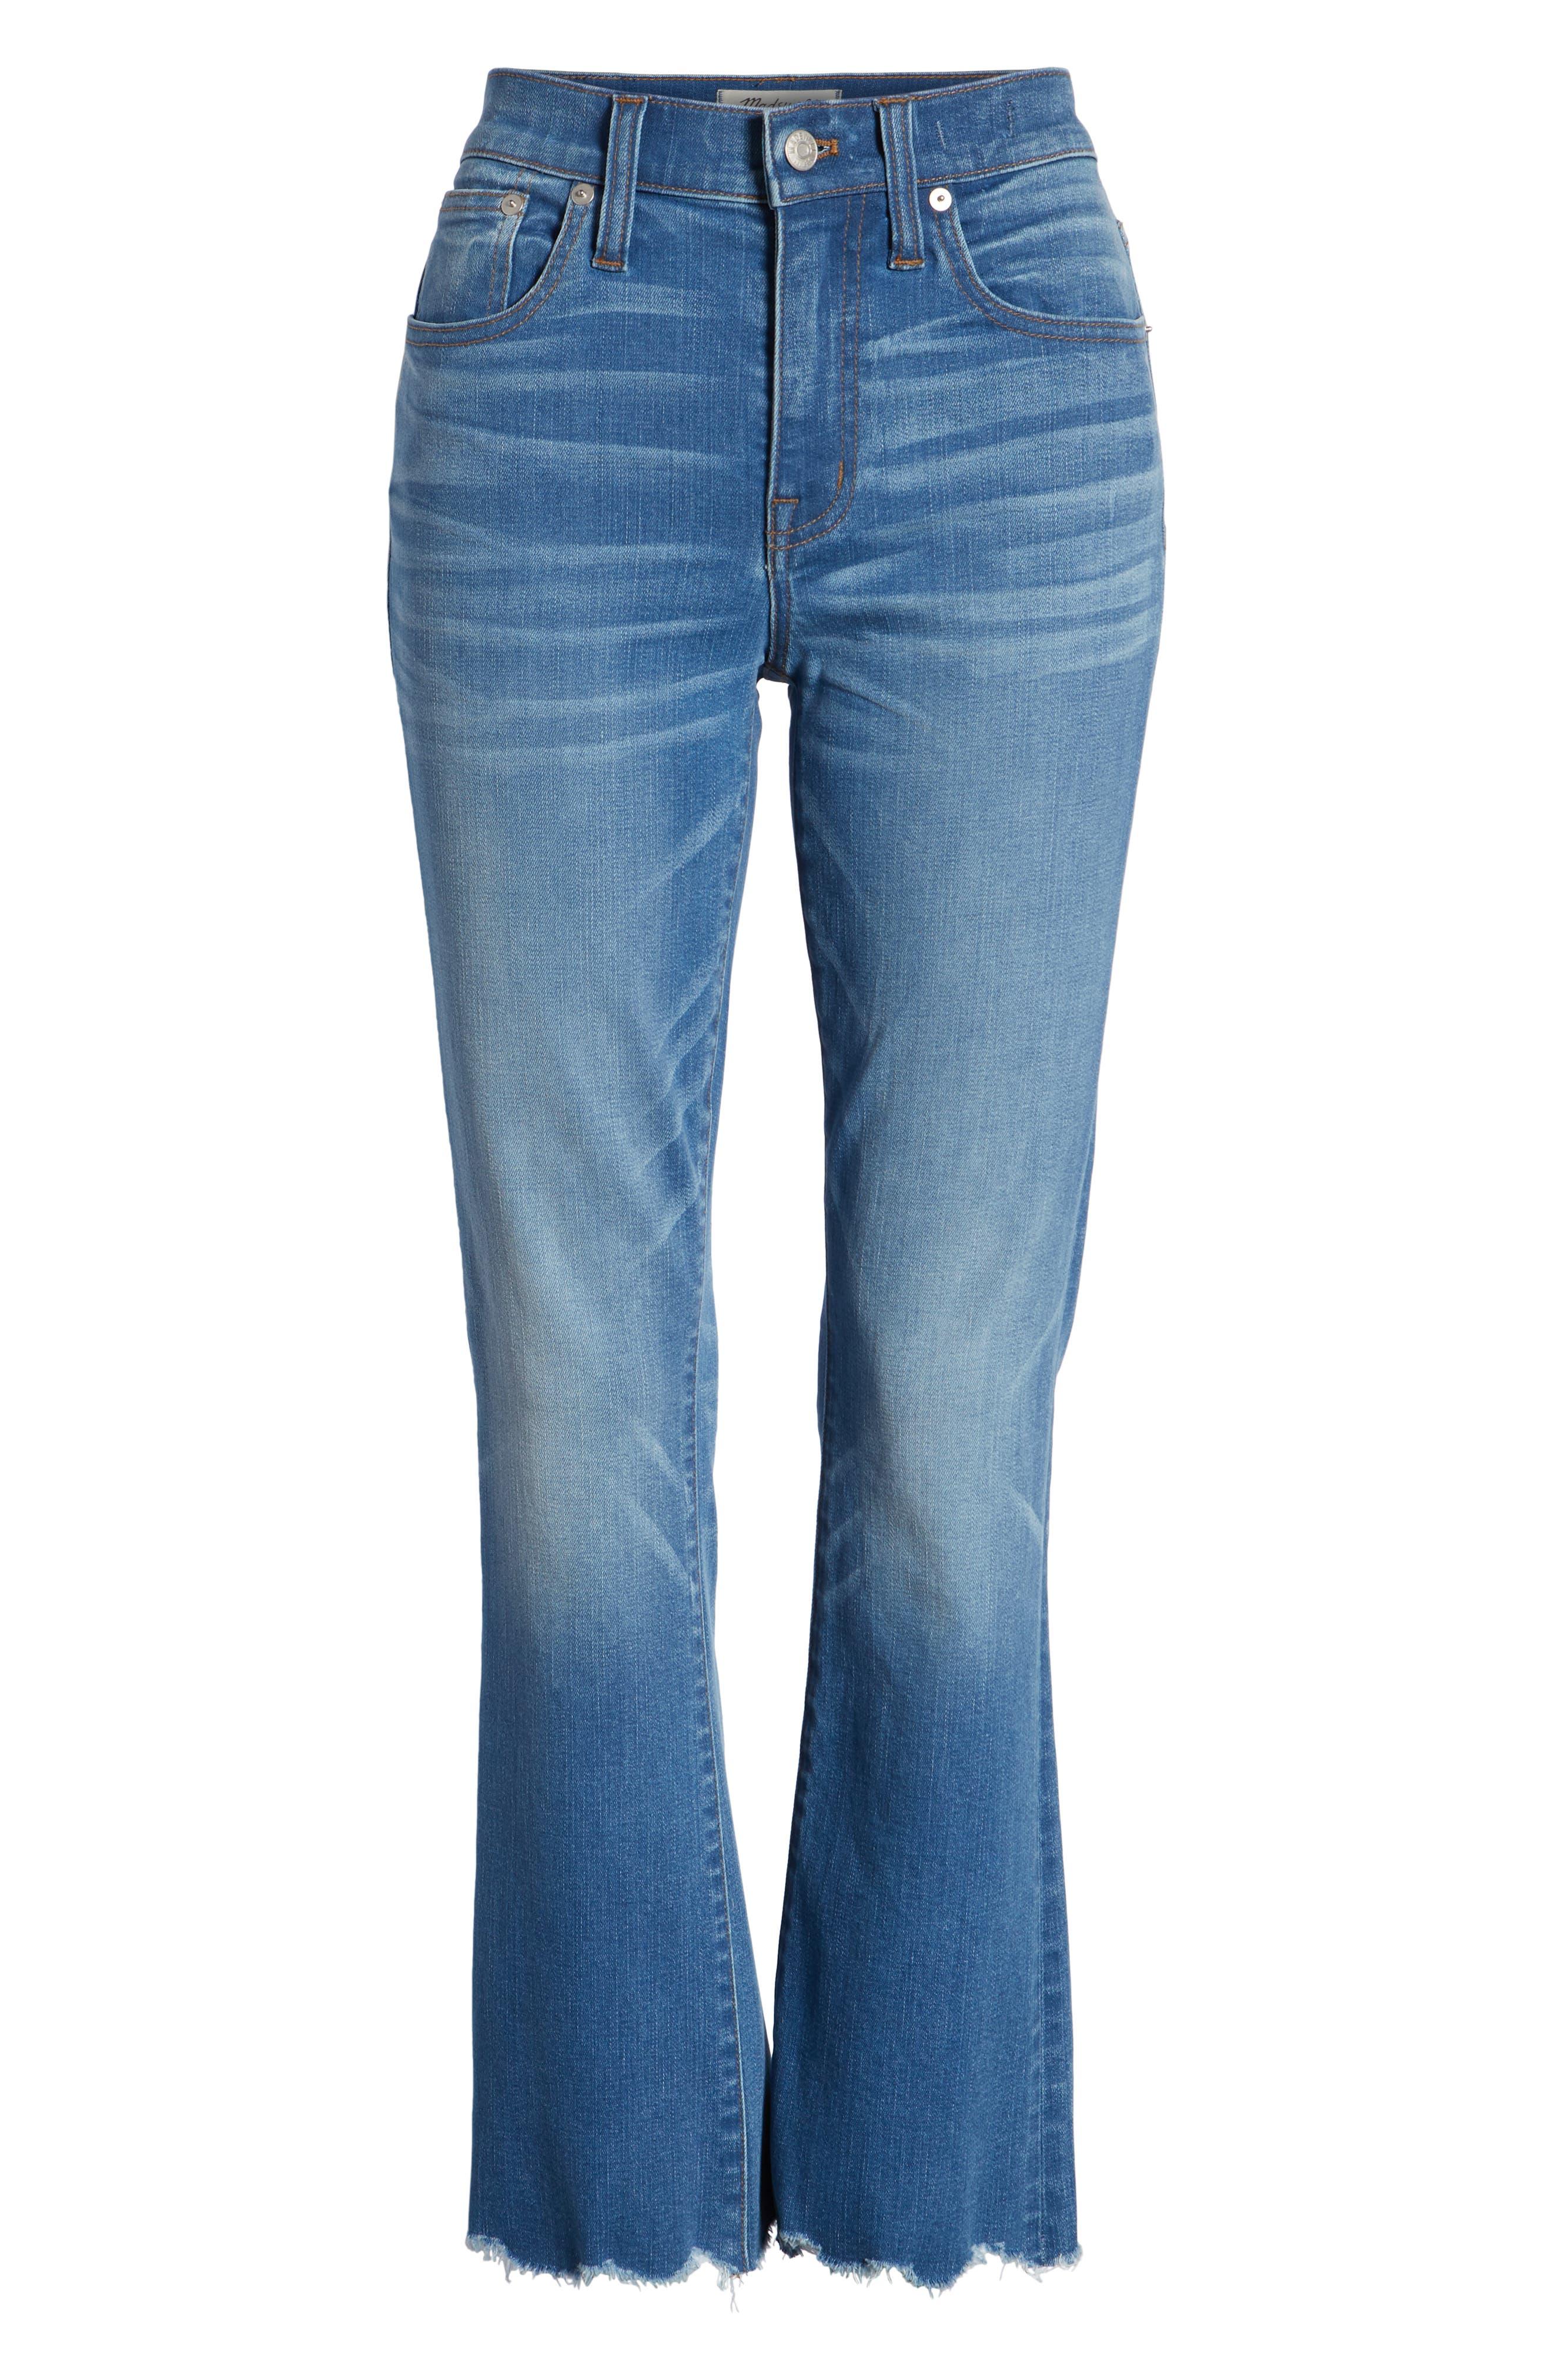 Cali Demi Boot Jeans,                             Alternate thumbnail 7, color,                             400